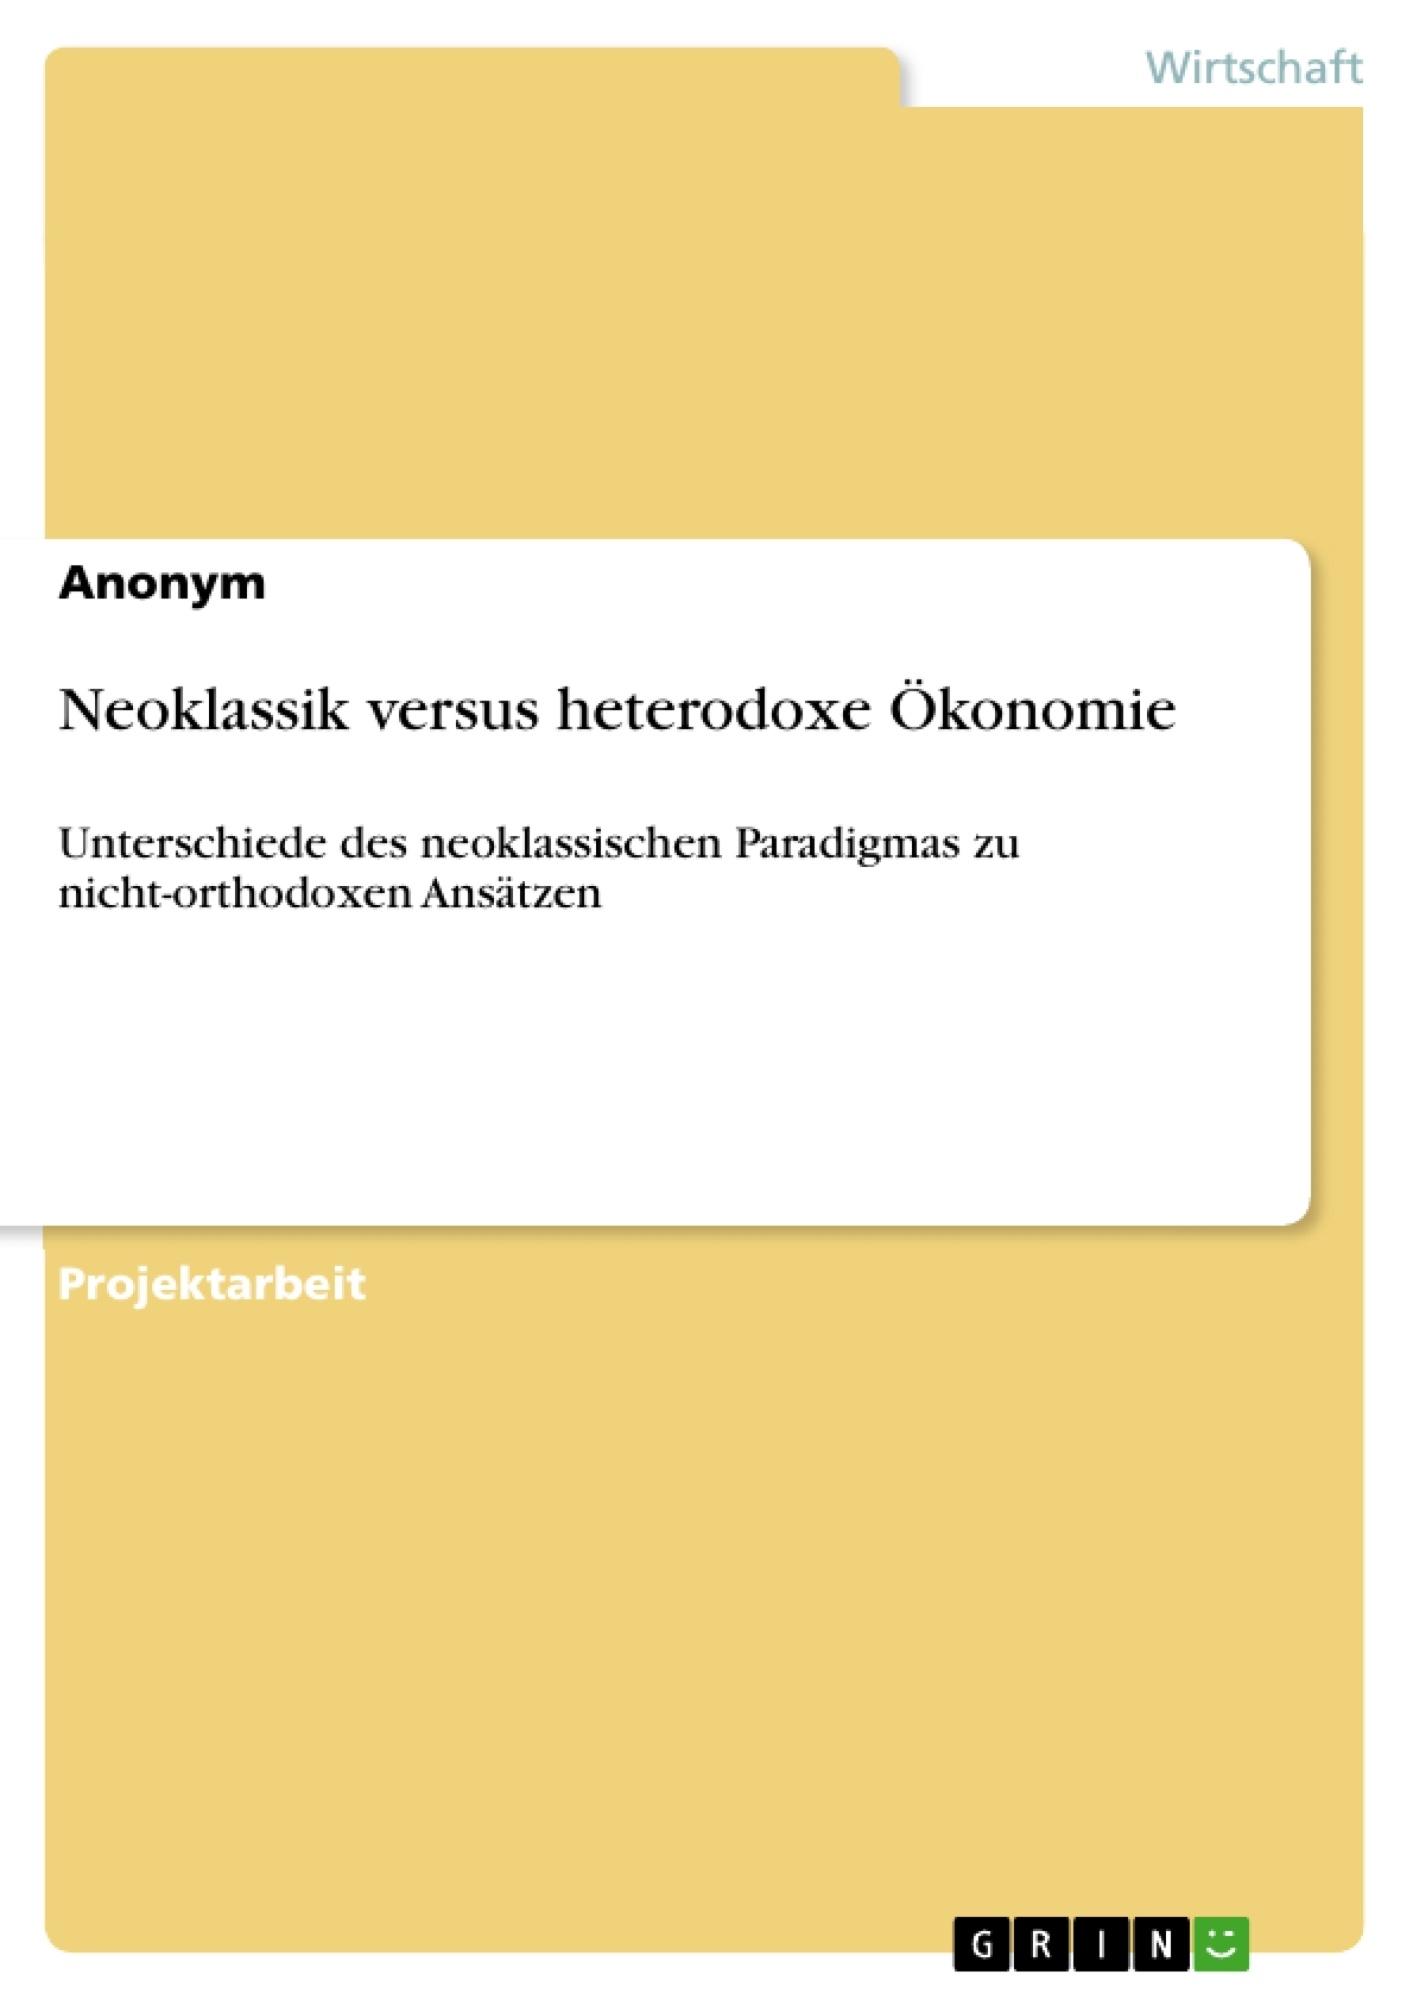 Titel: Neoklassik versus heterodoxe Ökonomie